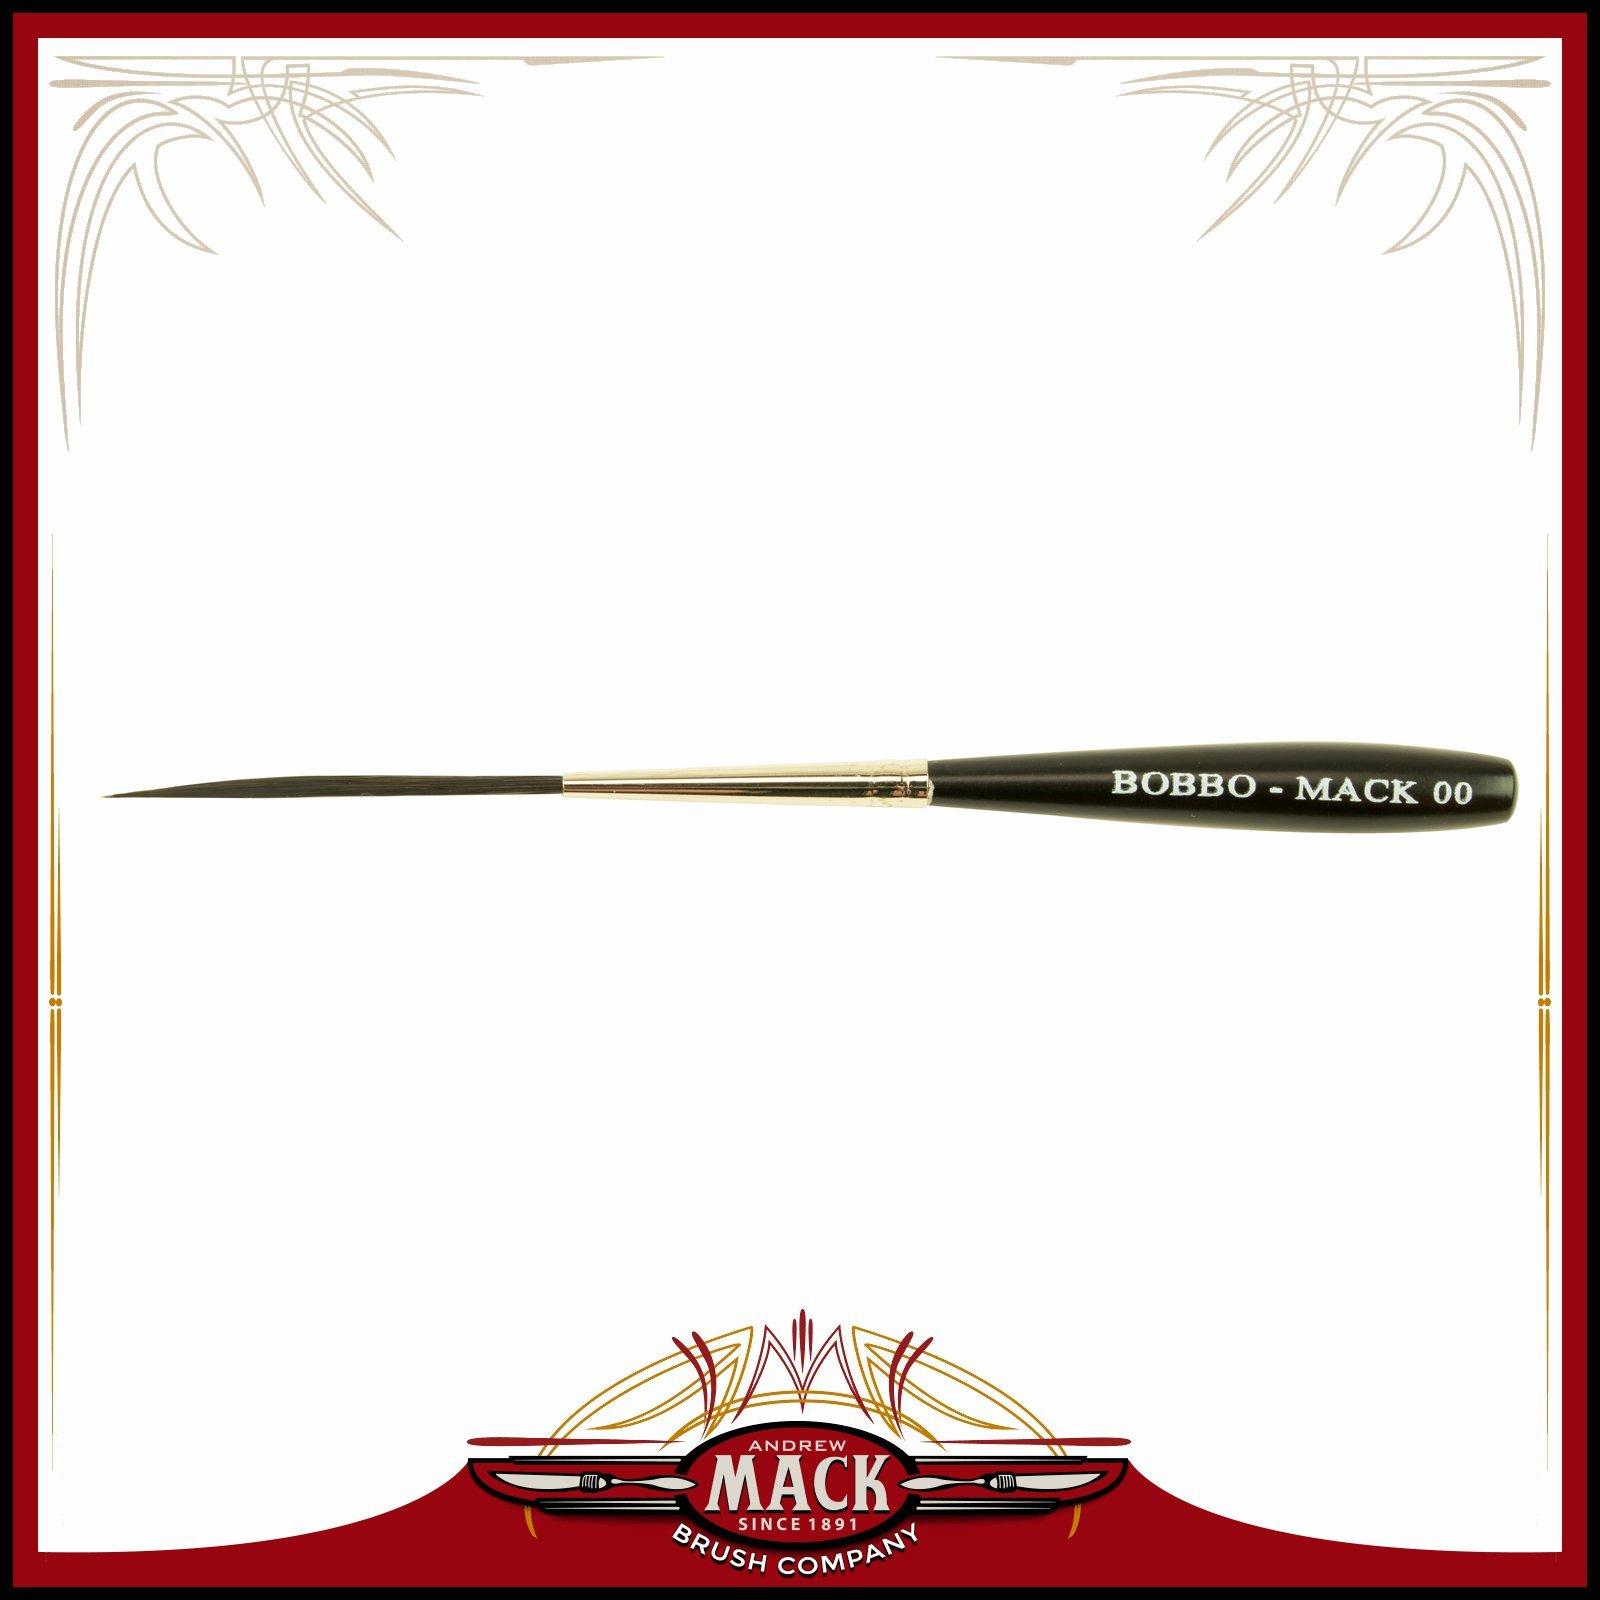 Size 00 Series Bobbo-Mack Super Quad 4 Action Scroll Pinstriper Brush Blue Squirrel & Black Synthetic Hair